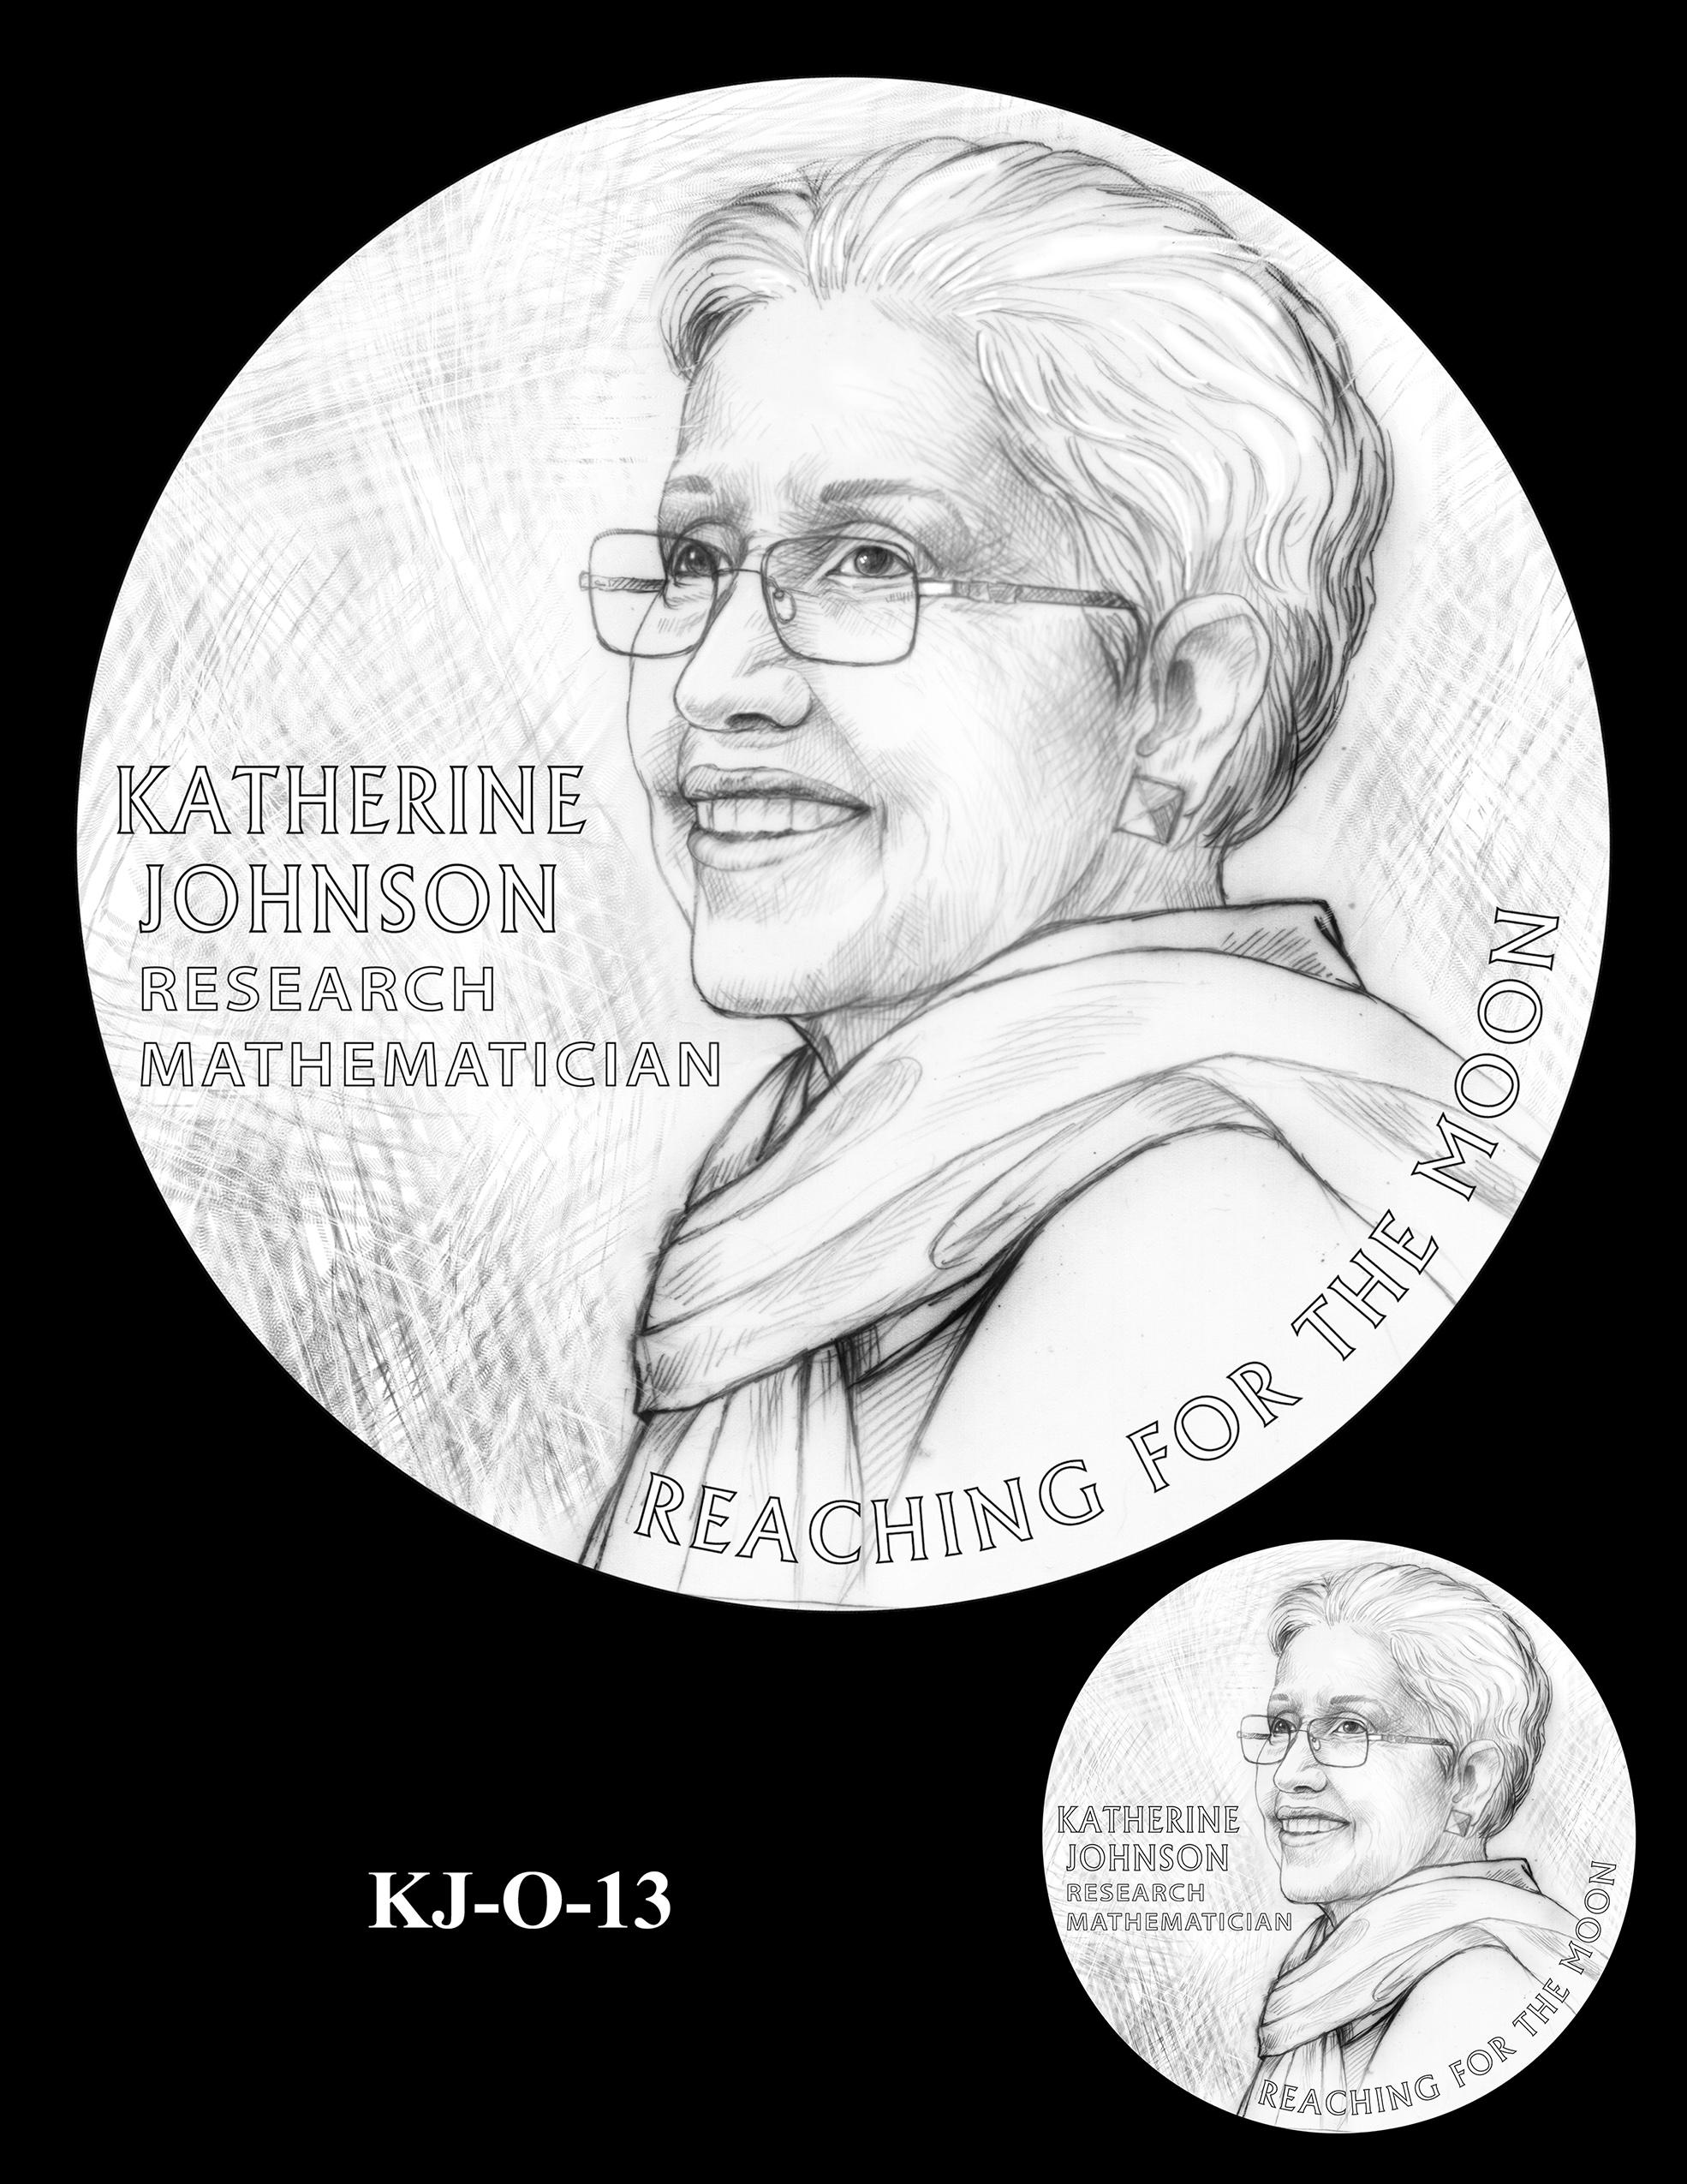 KJ-O-13 -- Katherine Johnson Congressional Gold Medal